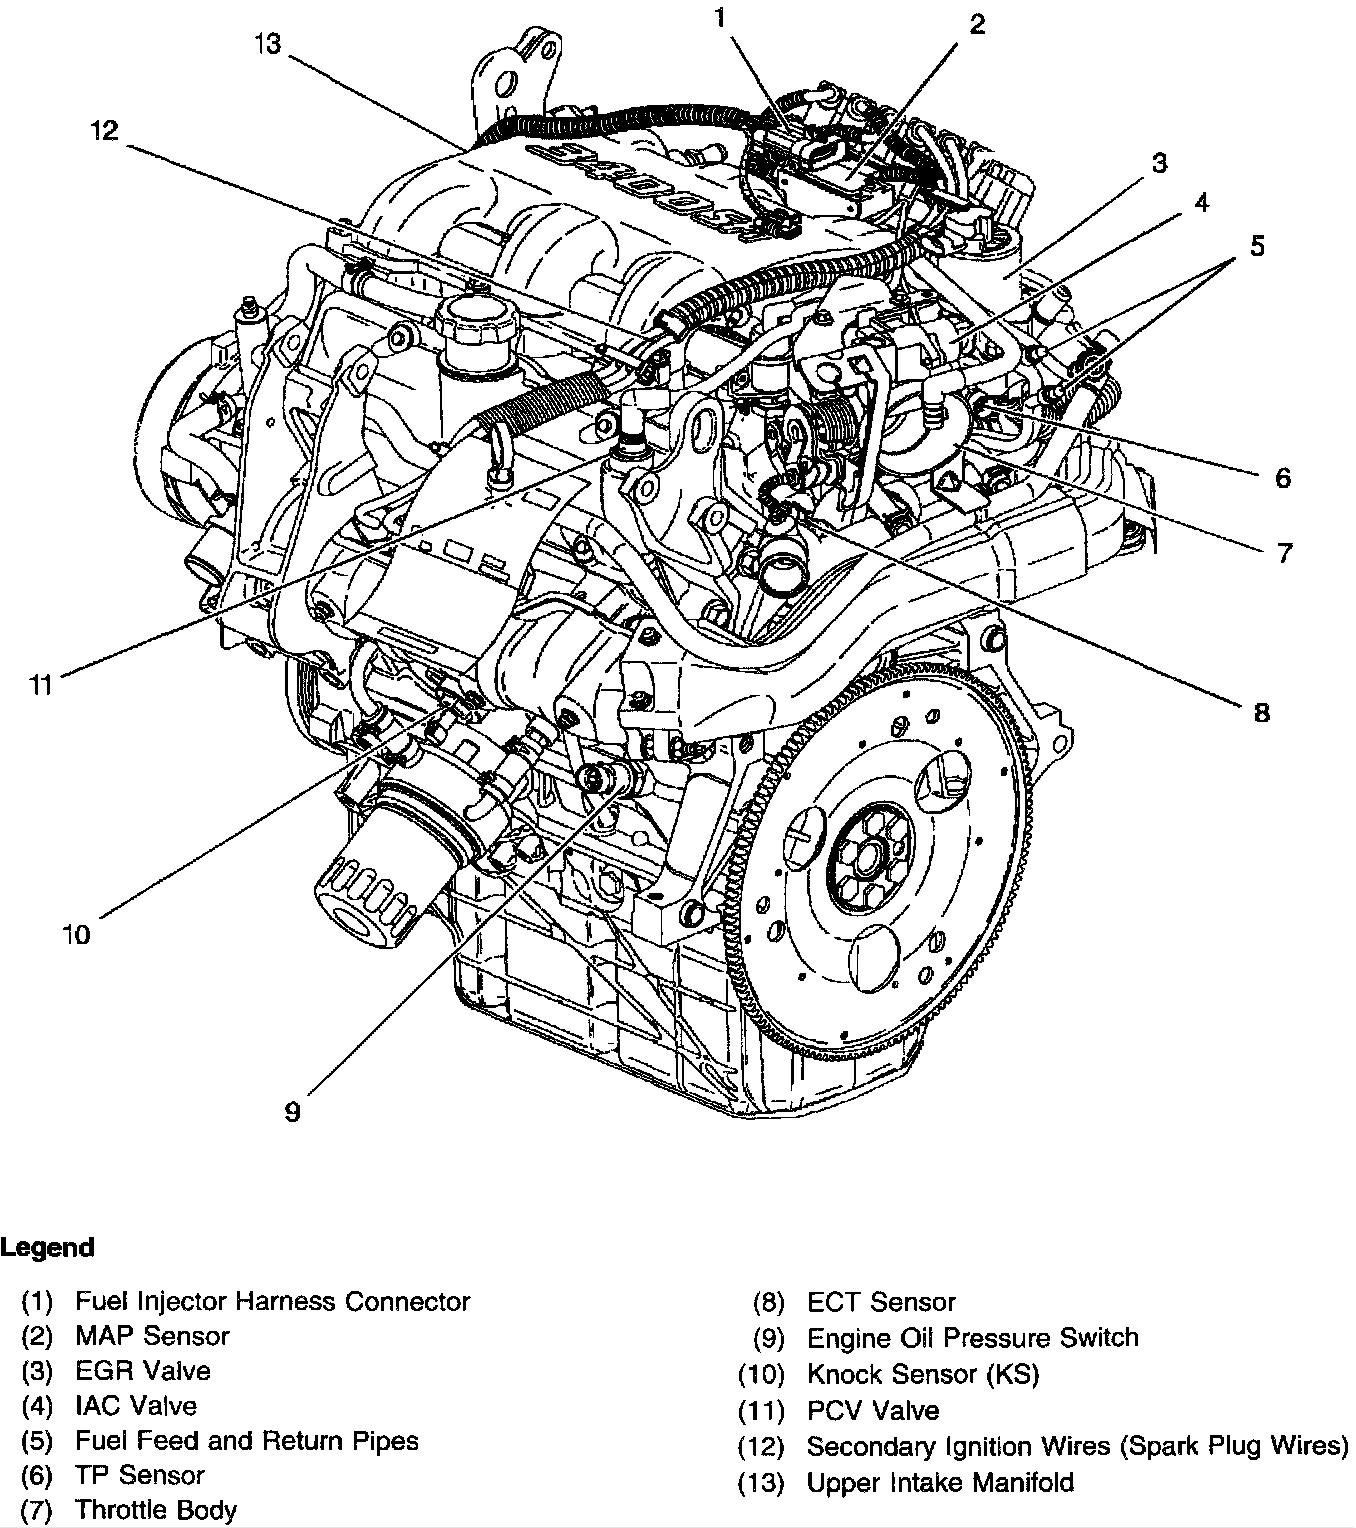 08 mazda 5 fuse box bladez electric scooter 24 volt wiring diagram 3400 SFI Engine chevy 3400 engine diagram Chevy 5.3 Engine Diagram chevy 3400 engine diagram Pontiac 400 Engine Diagram